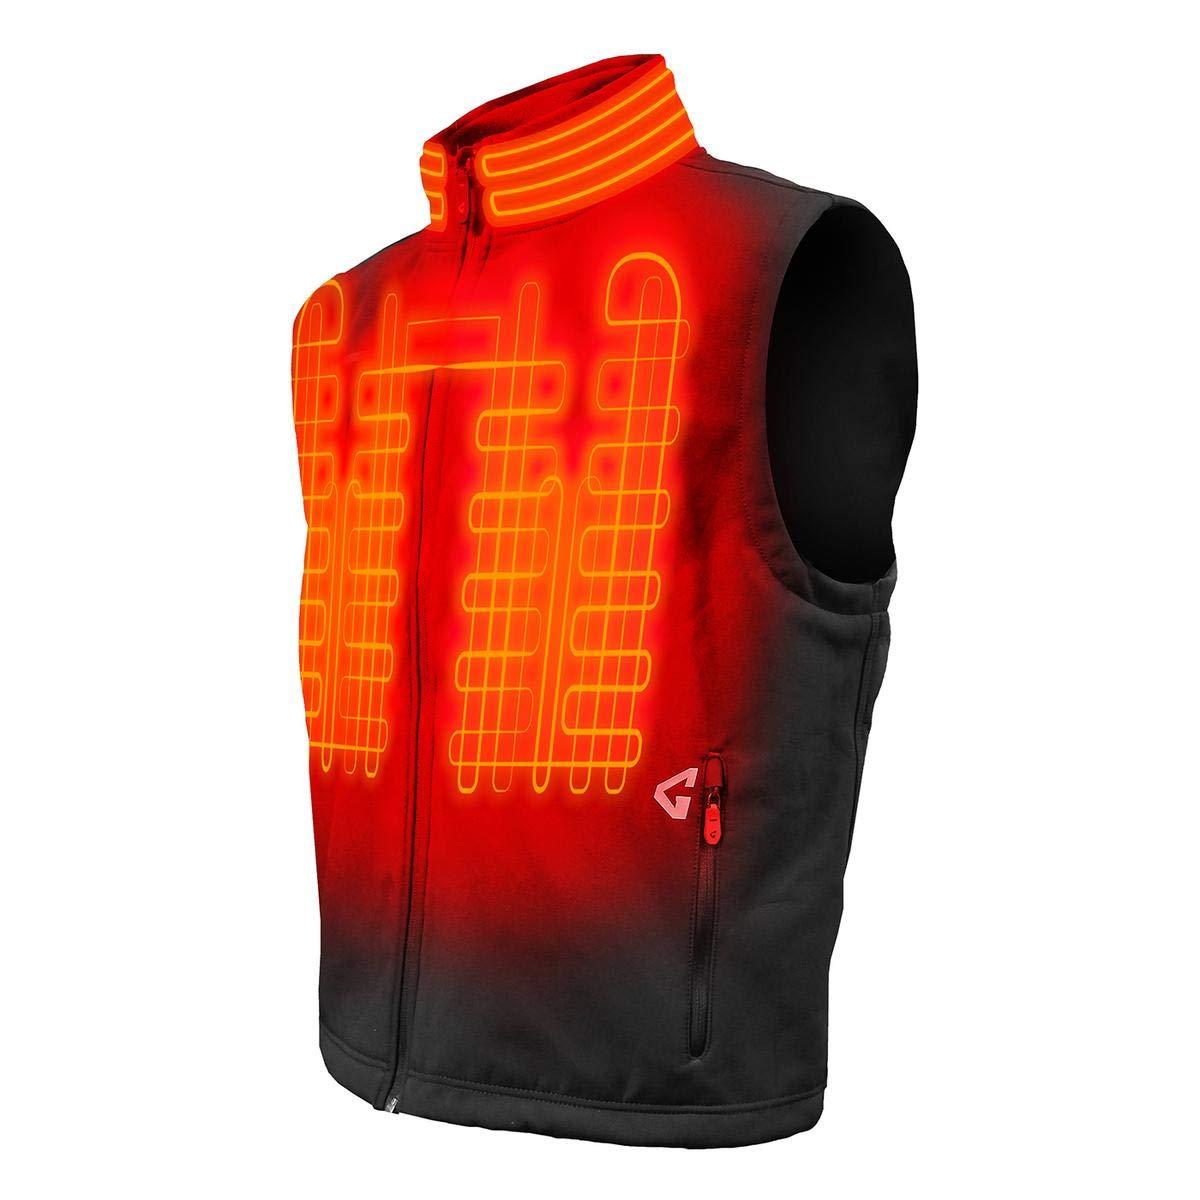 Gerbing Gyde Torrid Softshell Vest – 7V Battery Heated Clothing for Men, Black